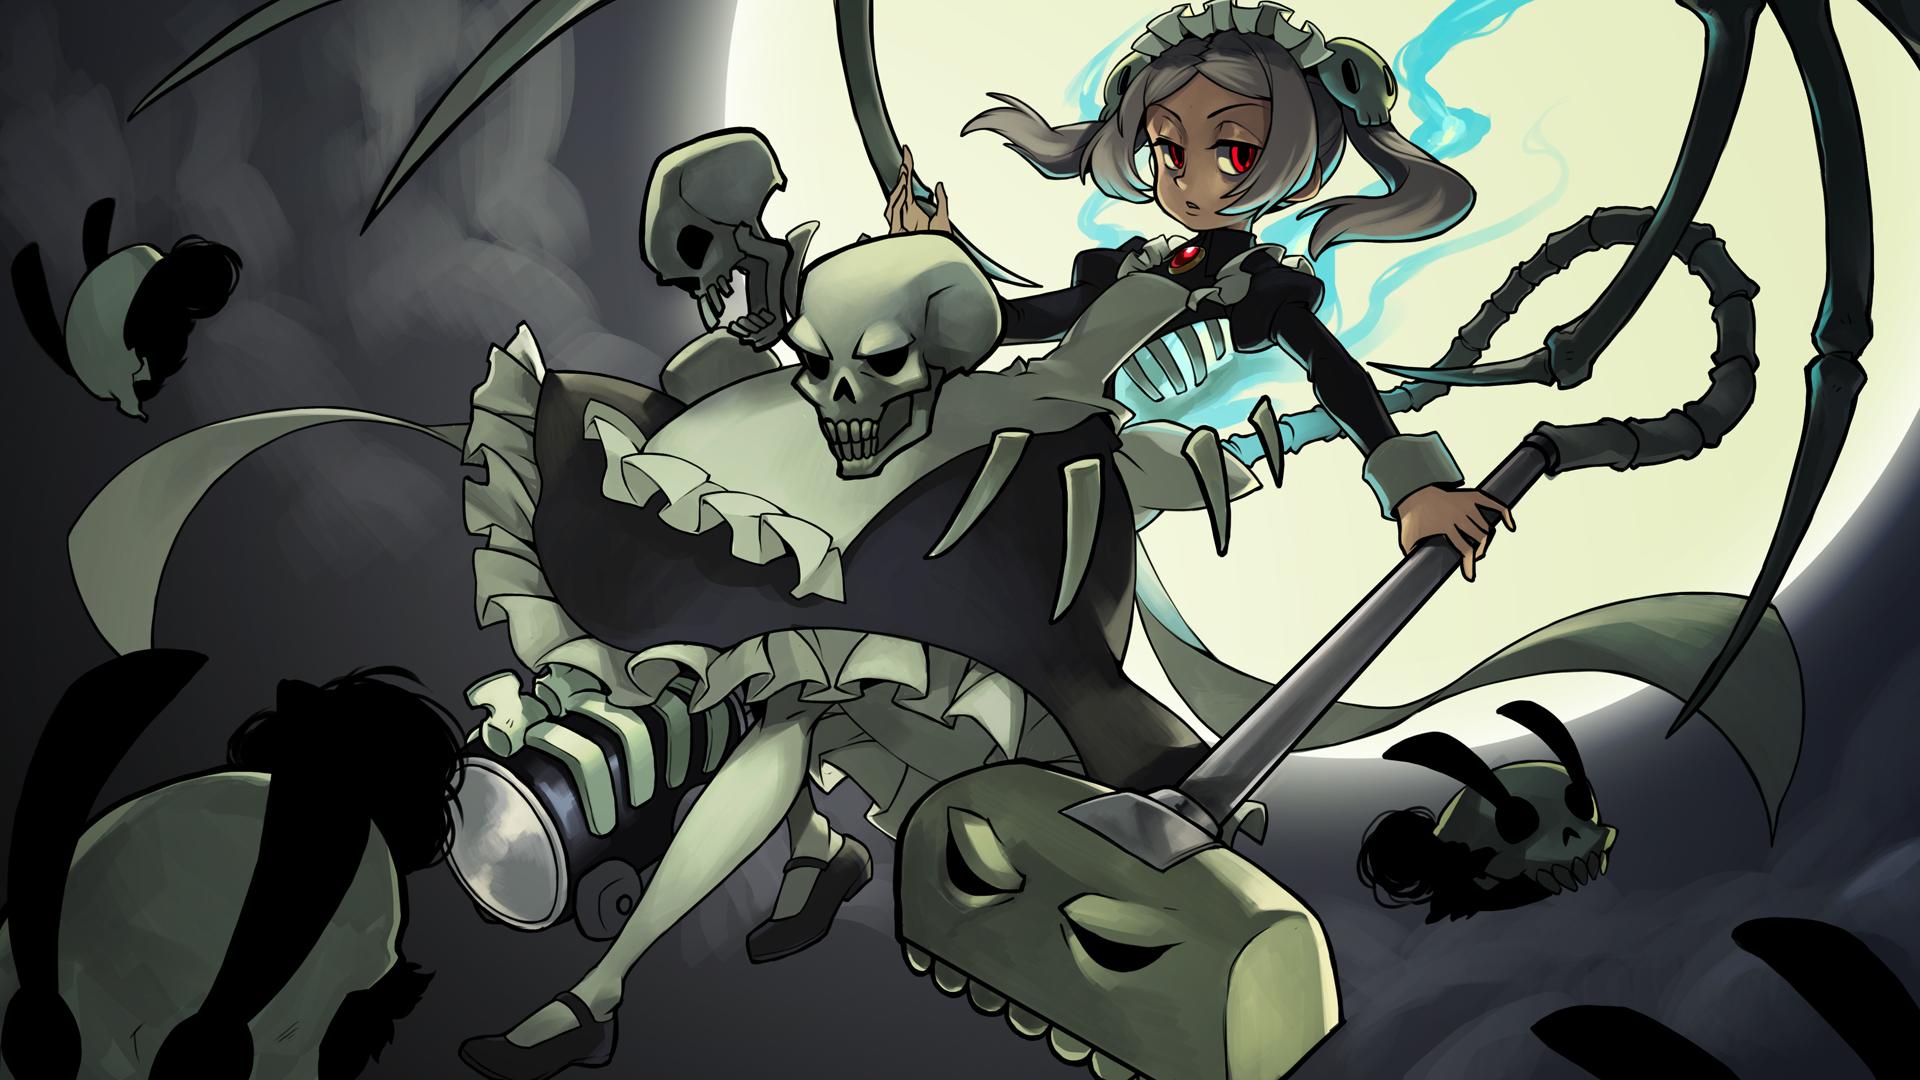 Skullgirls Bloody Marie wallpaper | 1920x1080 | 139750 ... Hd Wallpapers 1920x1080 Anime